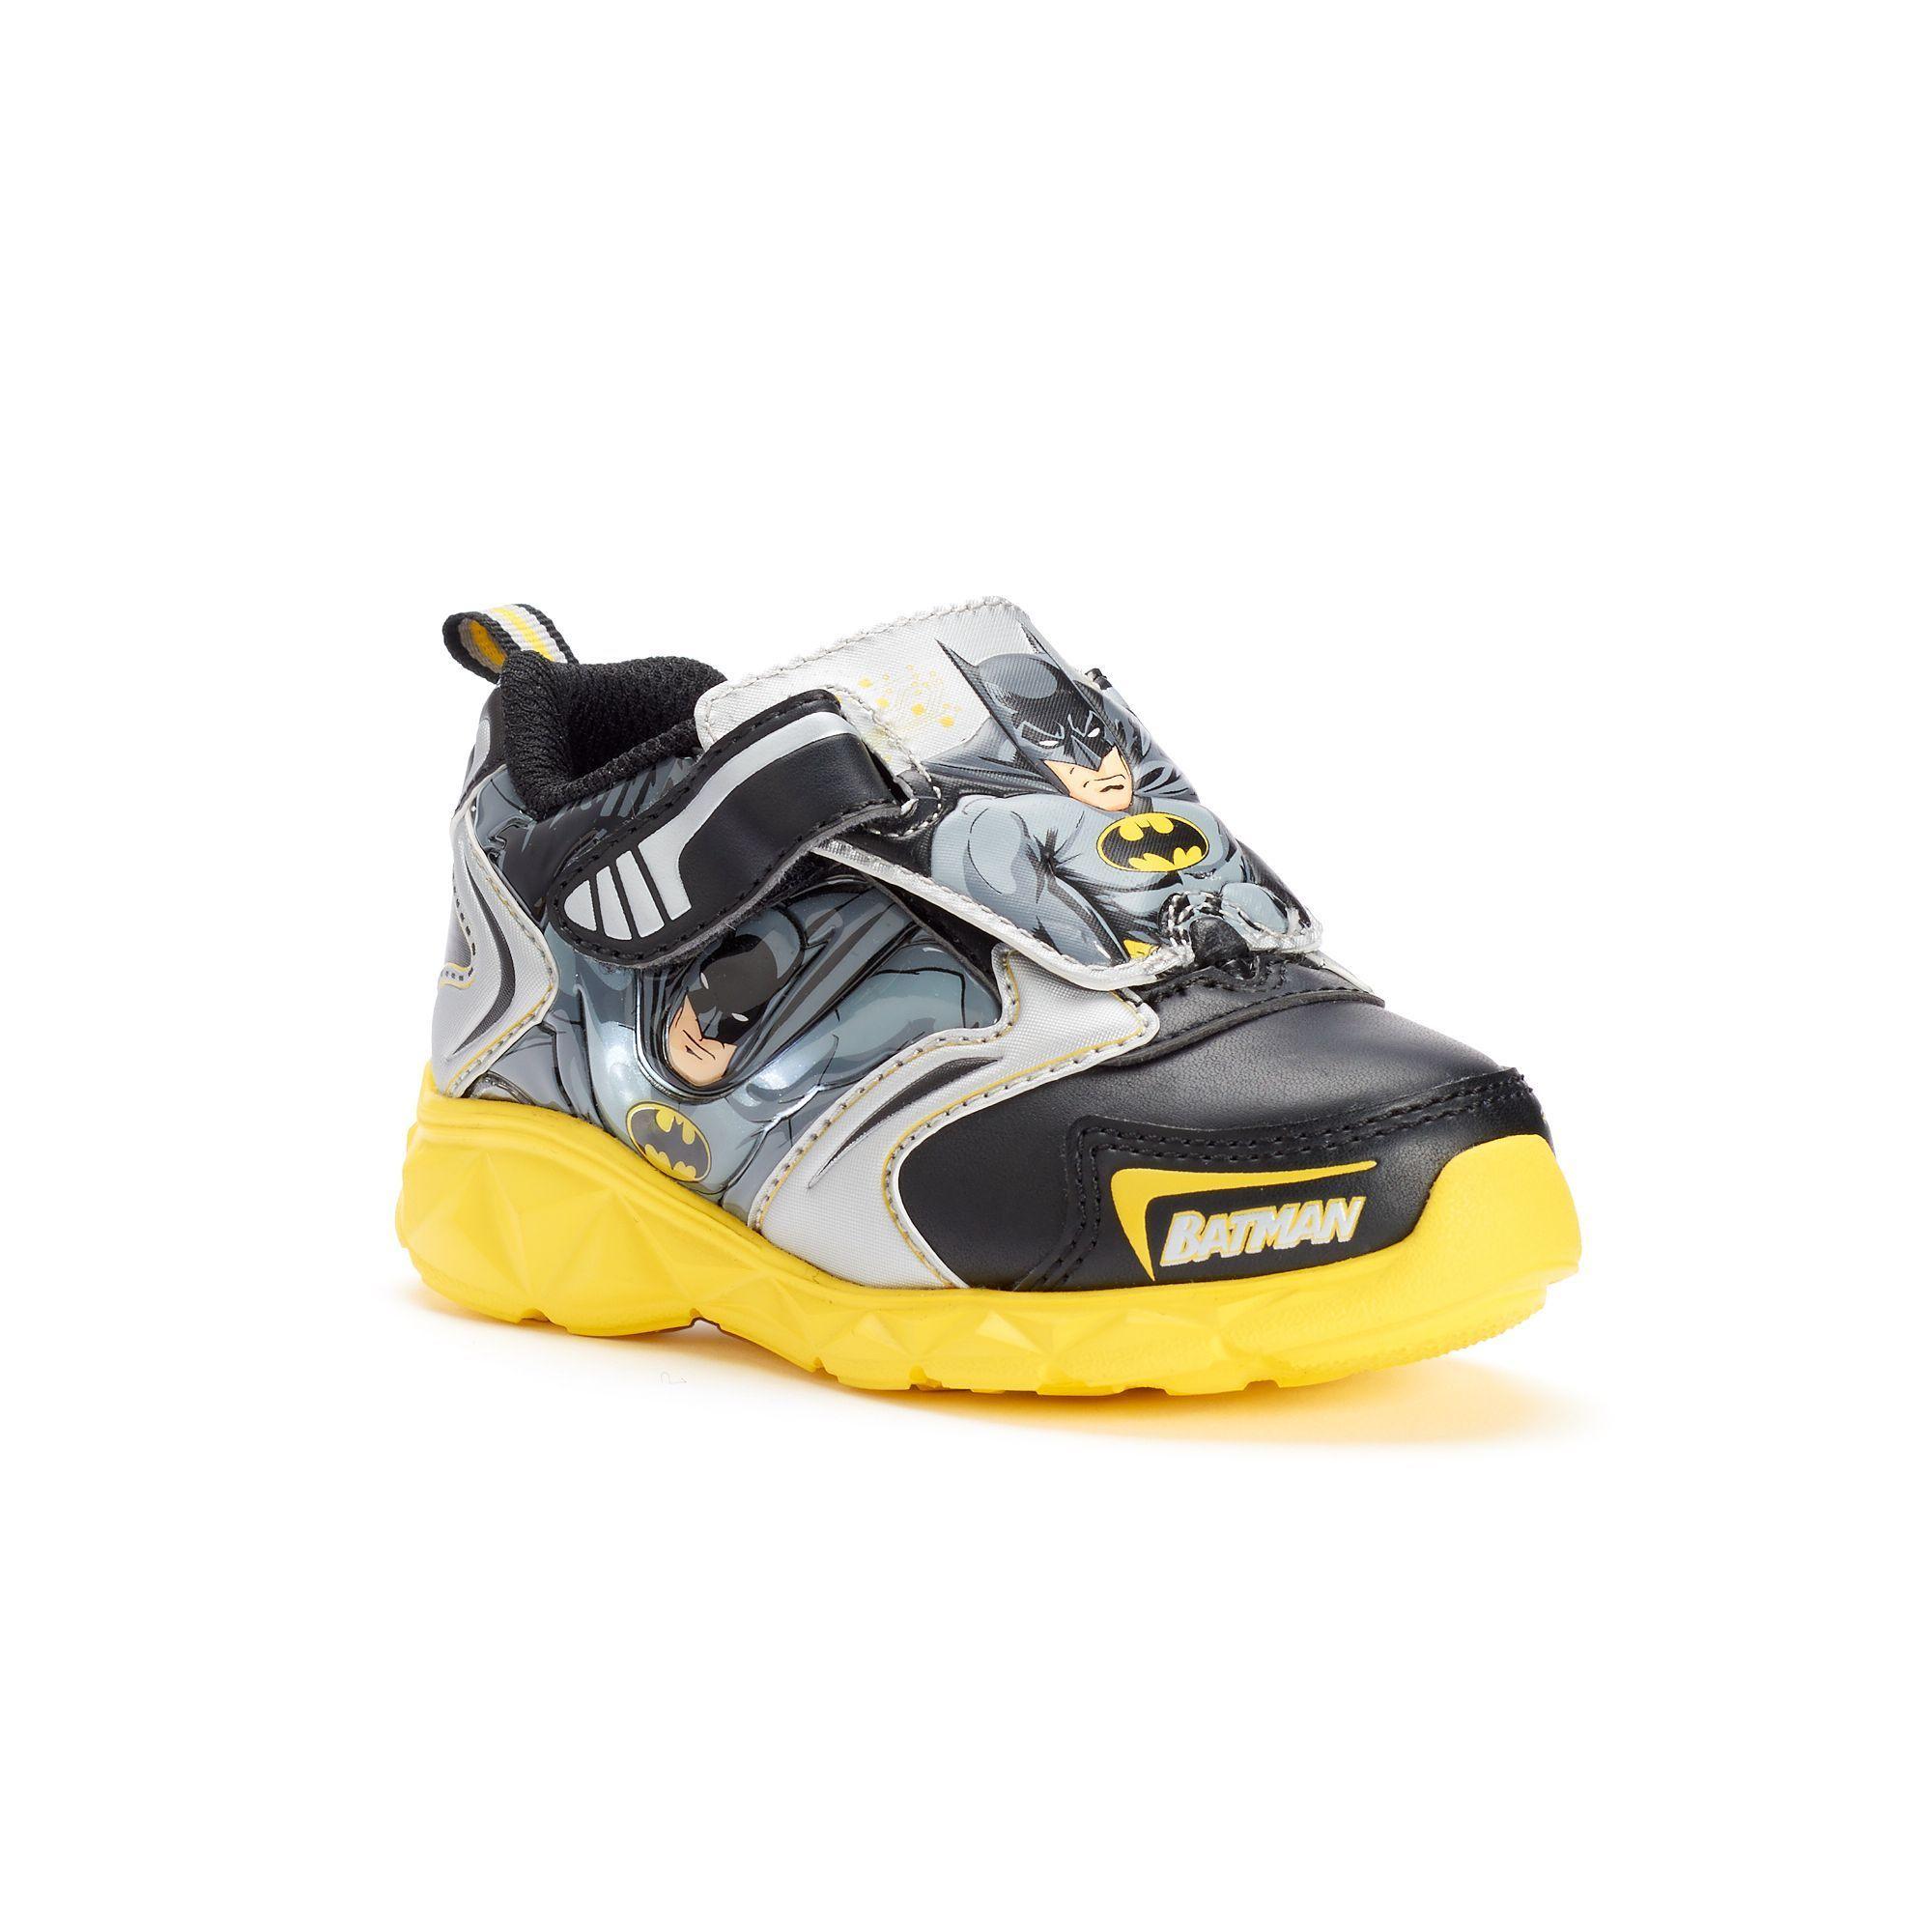 sandals hotlights light p sneakers design shoes skechers super lights hot up innovative boys